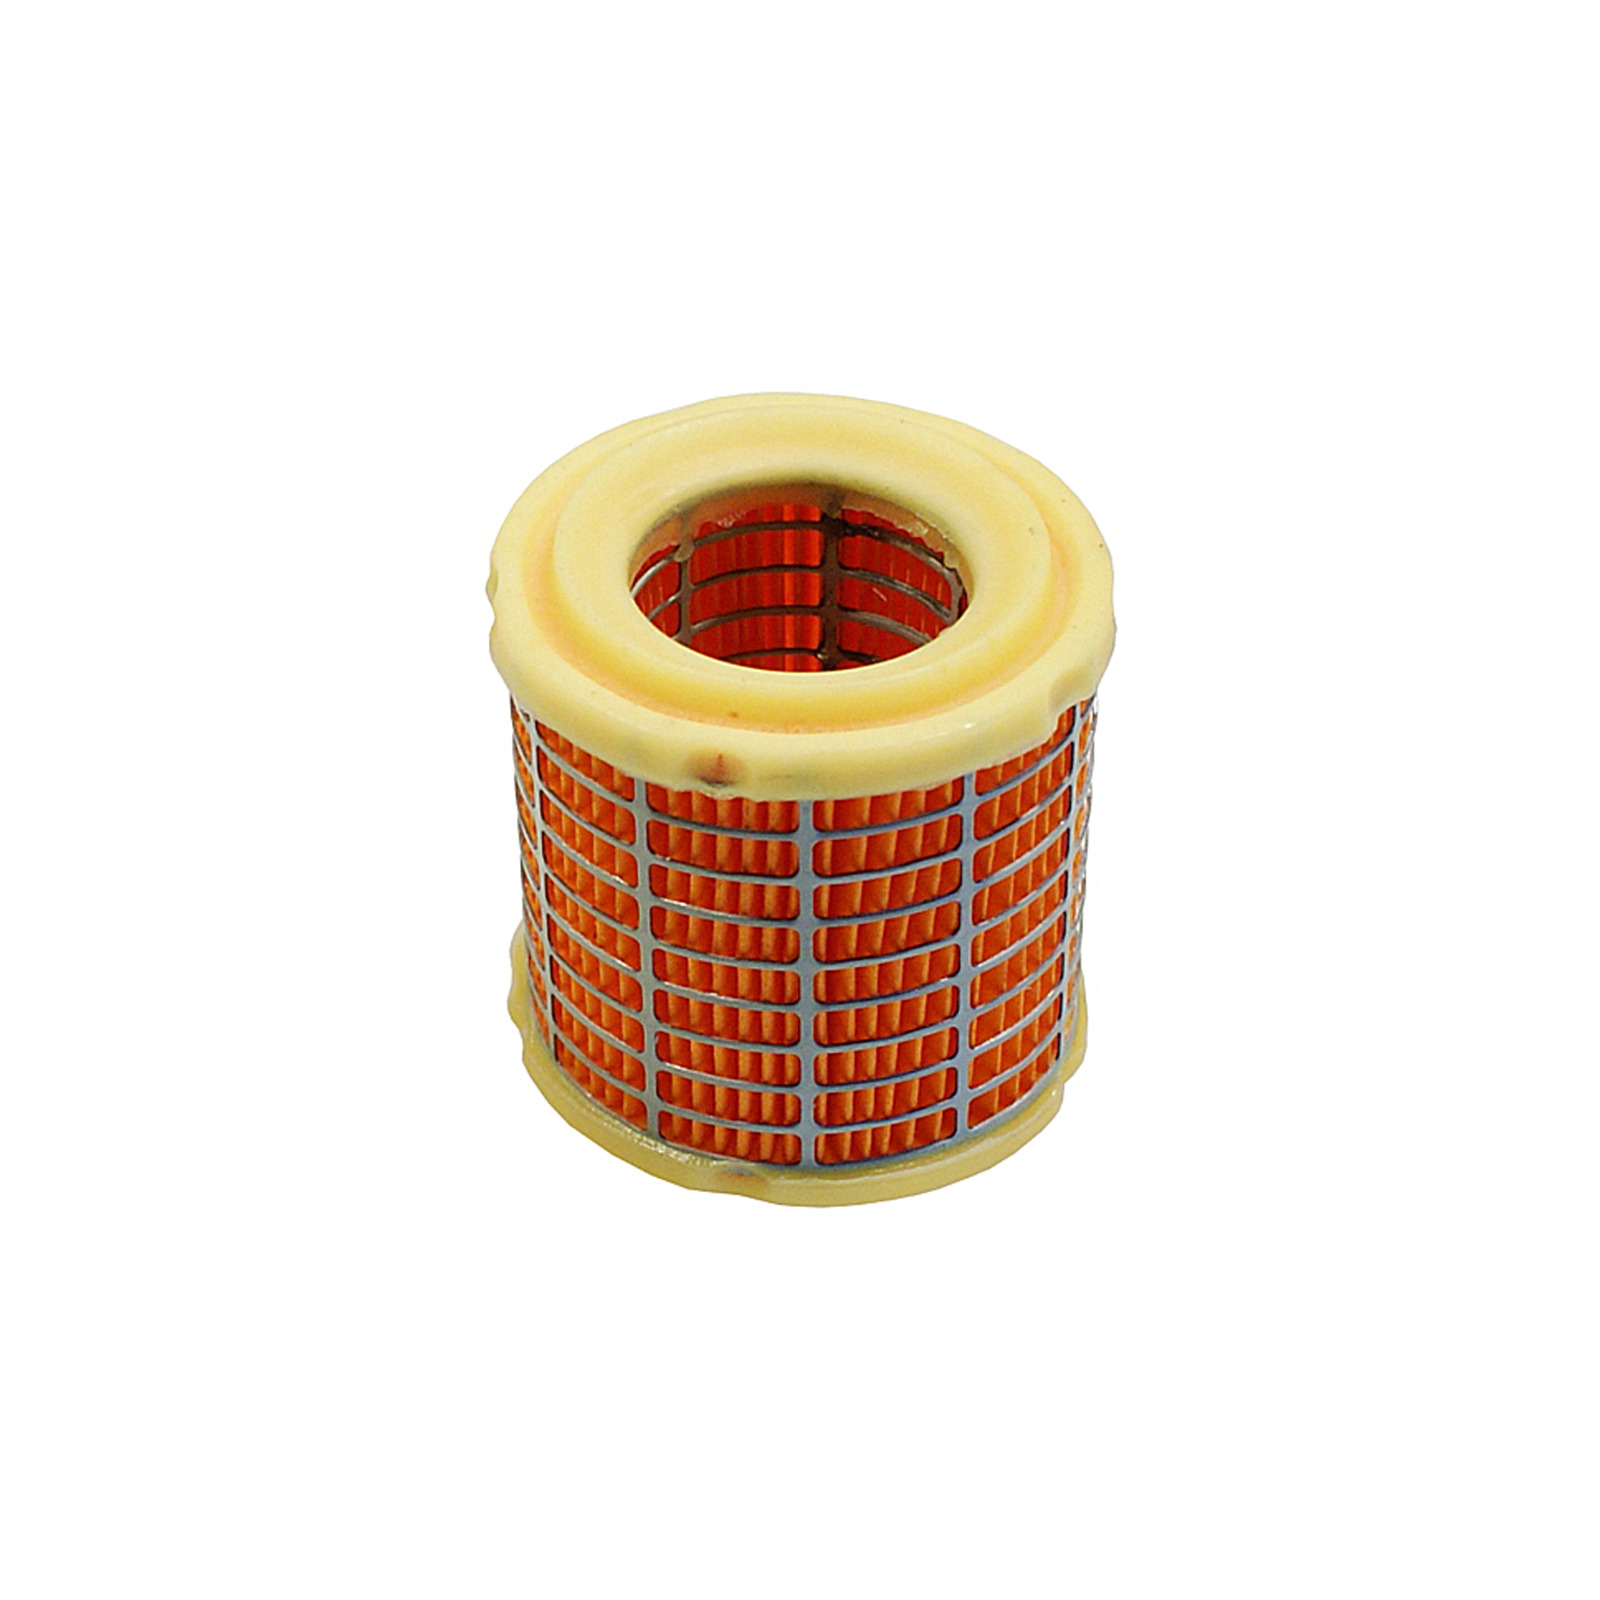 8E AUDI A4 8D 8H 2.5D Clutch Slave Cylinder 97 to 05 Manual Sachs 8E0721257N